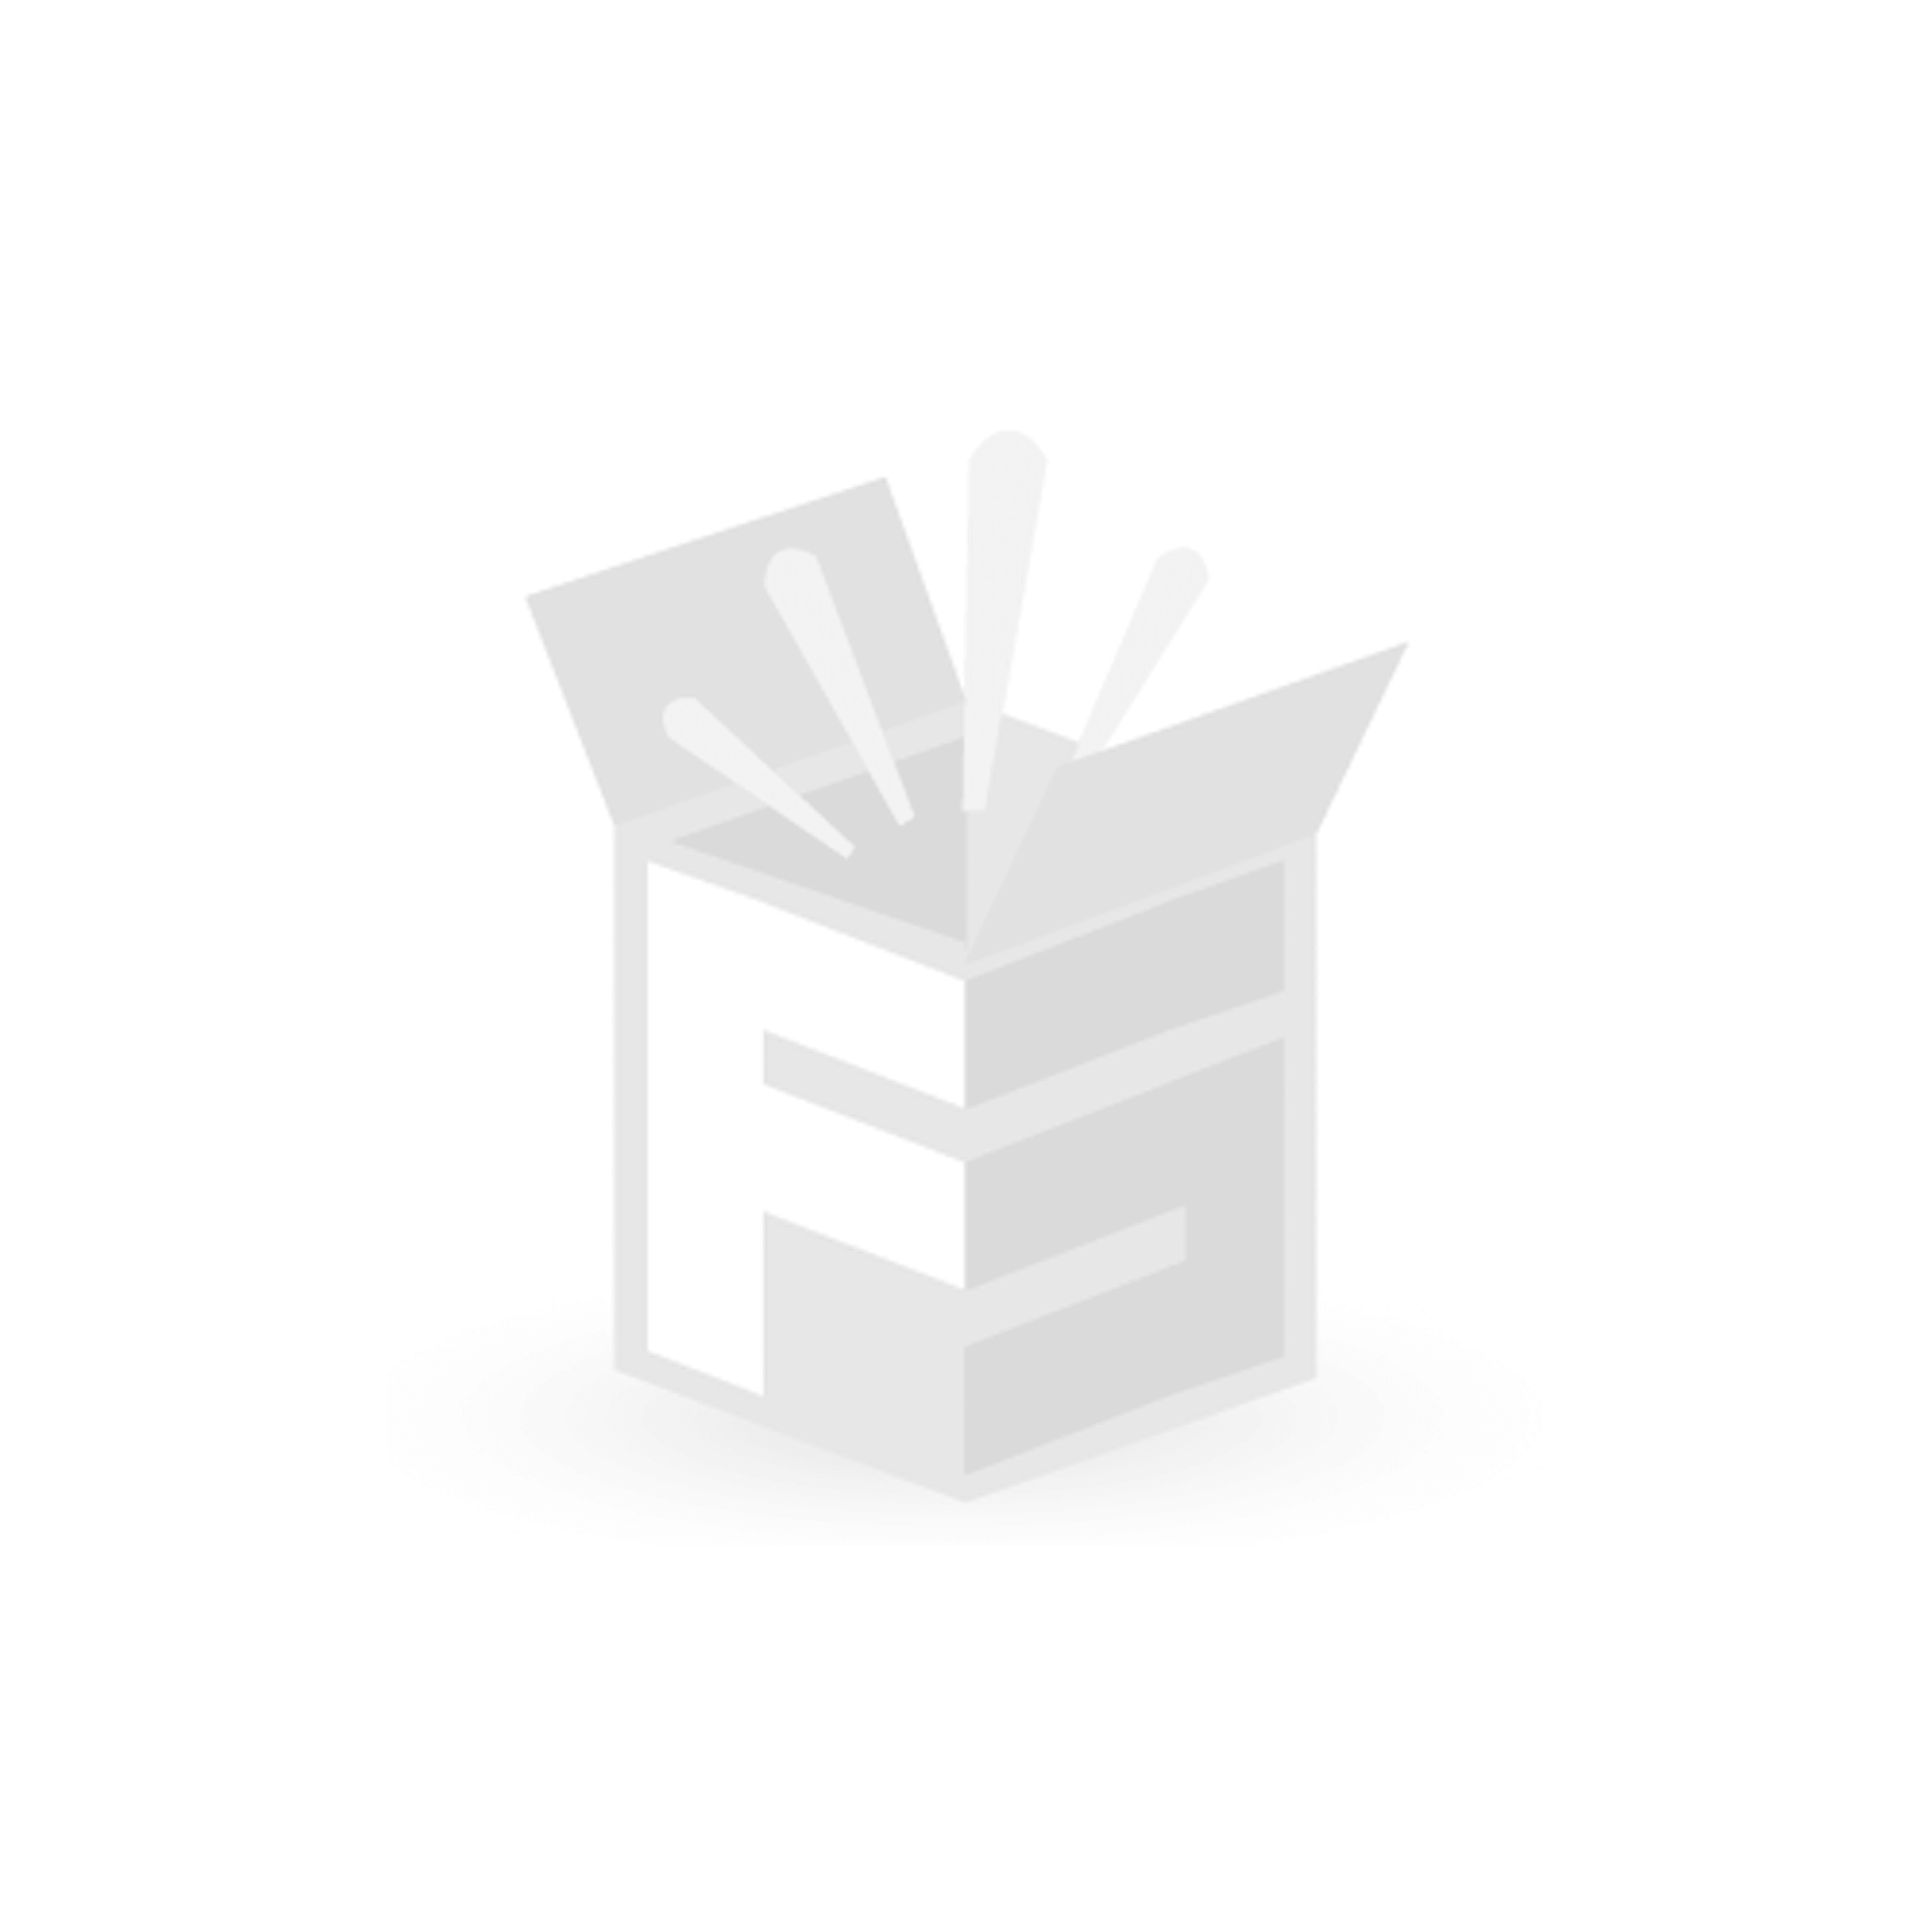 FS-STAR Teller aus Palmblatt, 6 Stück